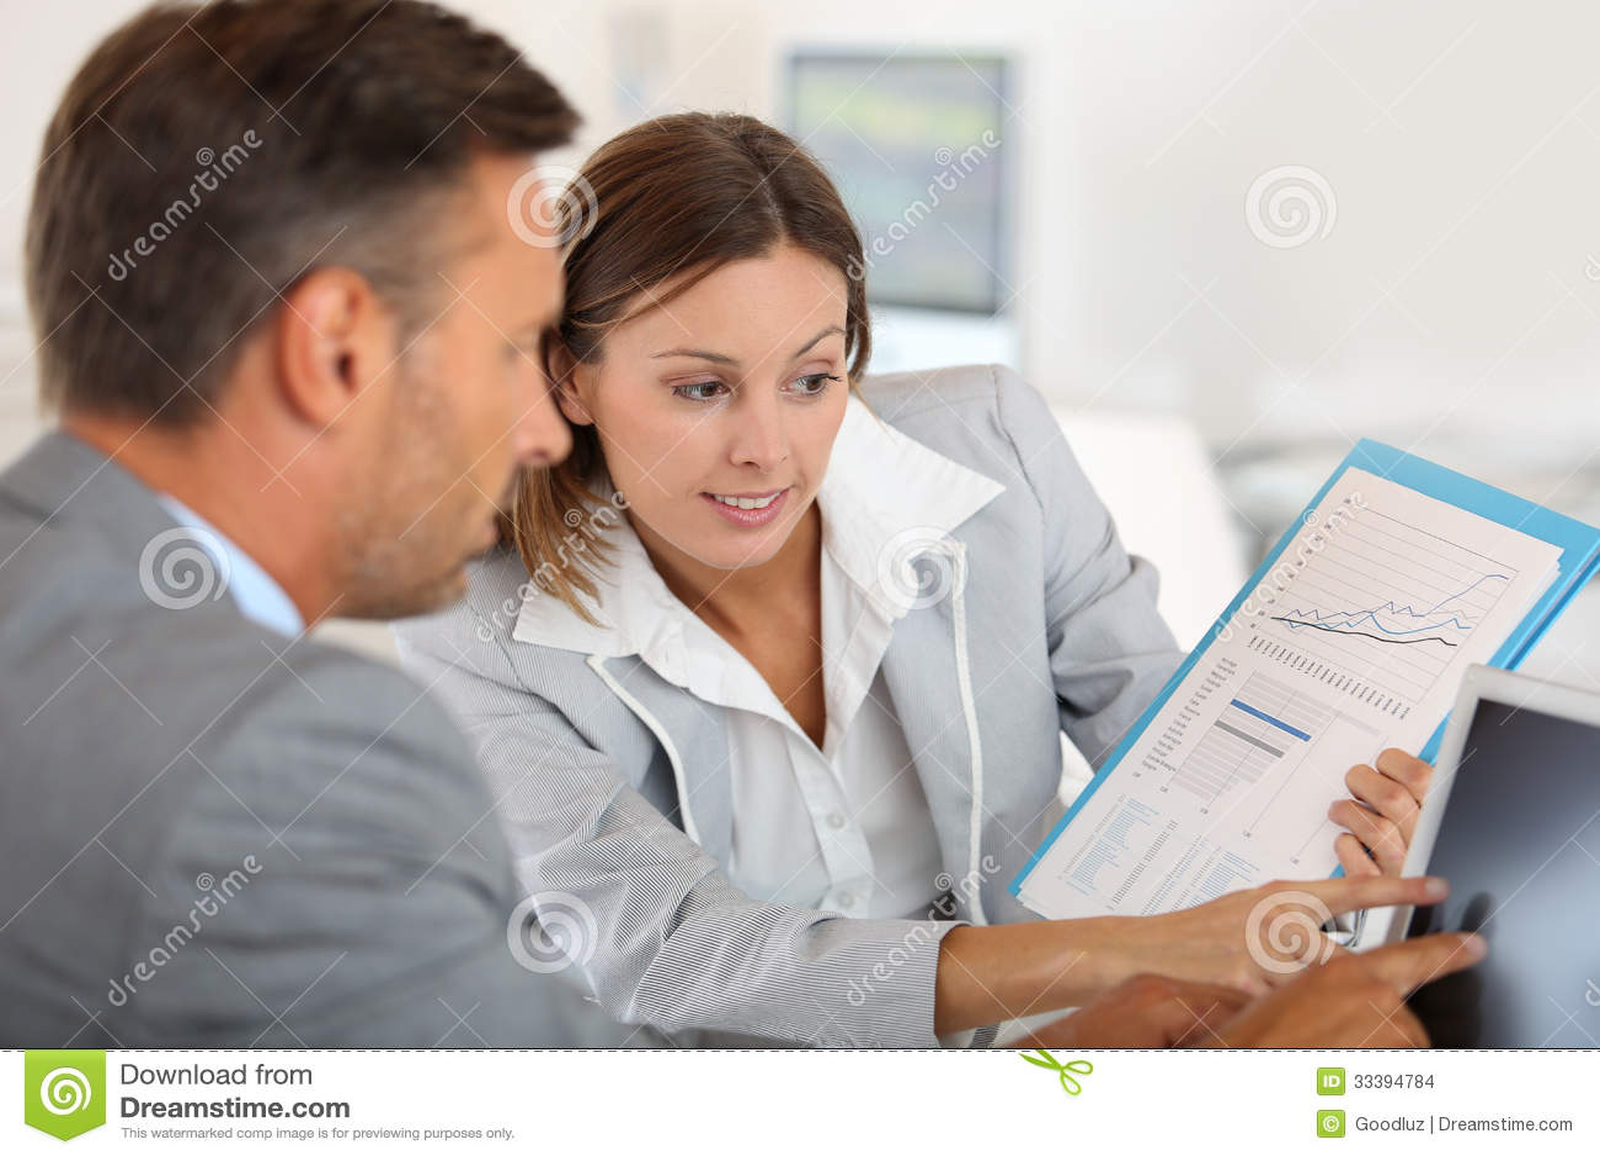 11+ Diversity Recruitment Plan Templates in PDF